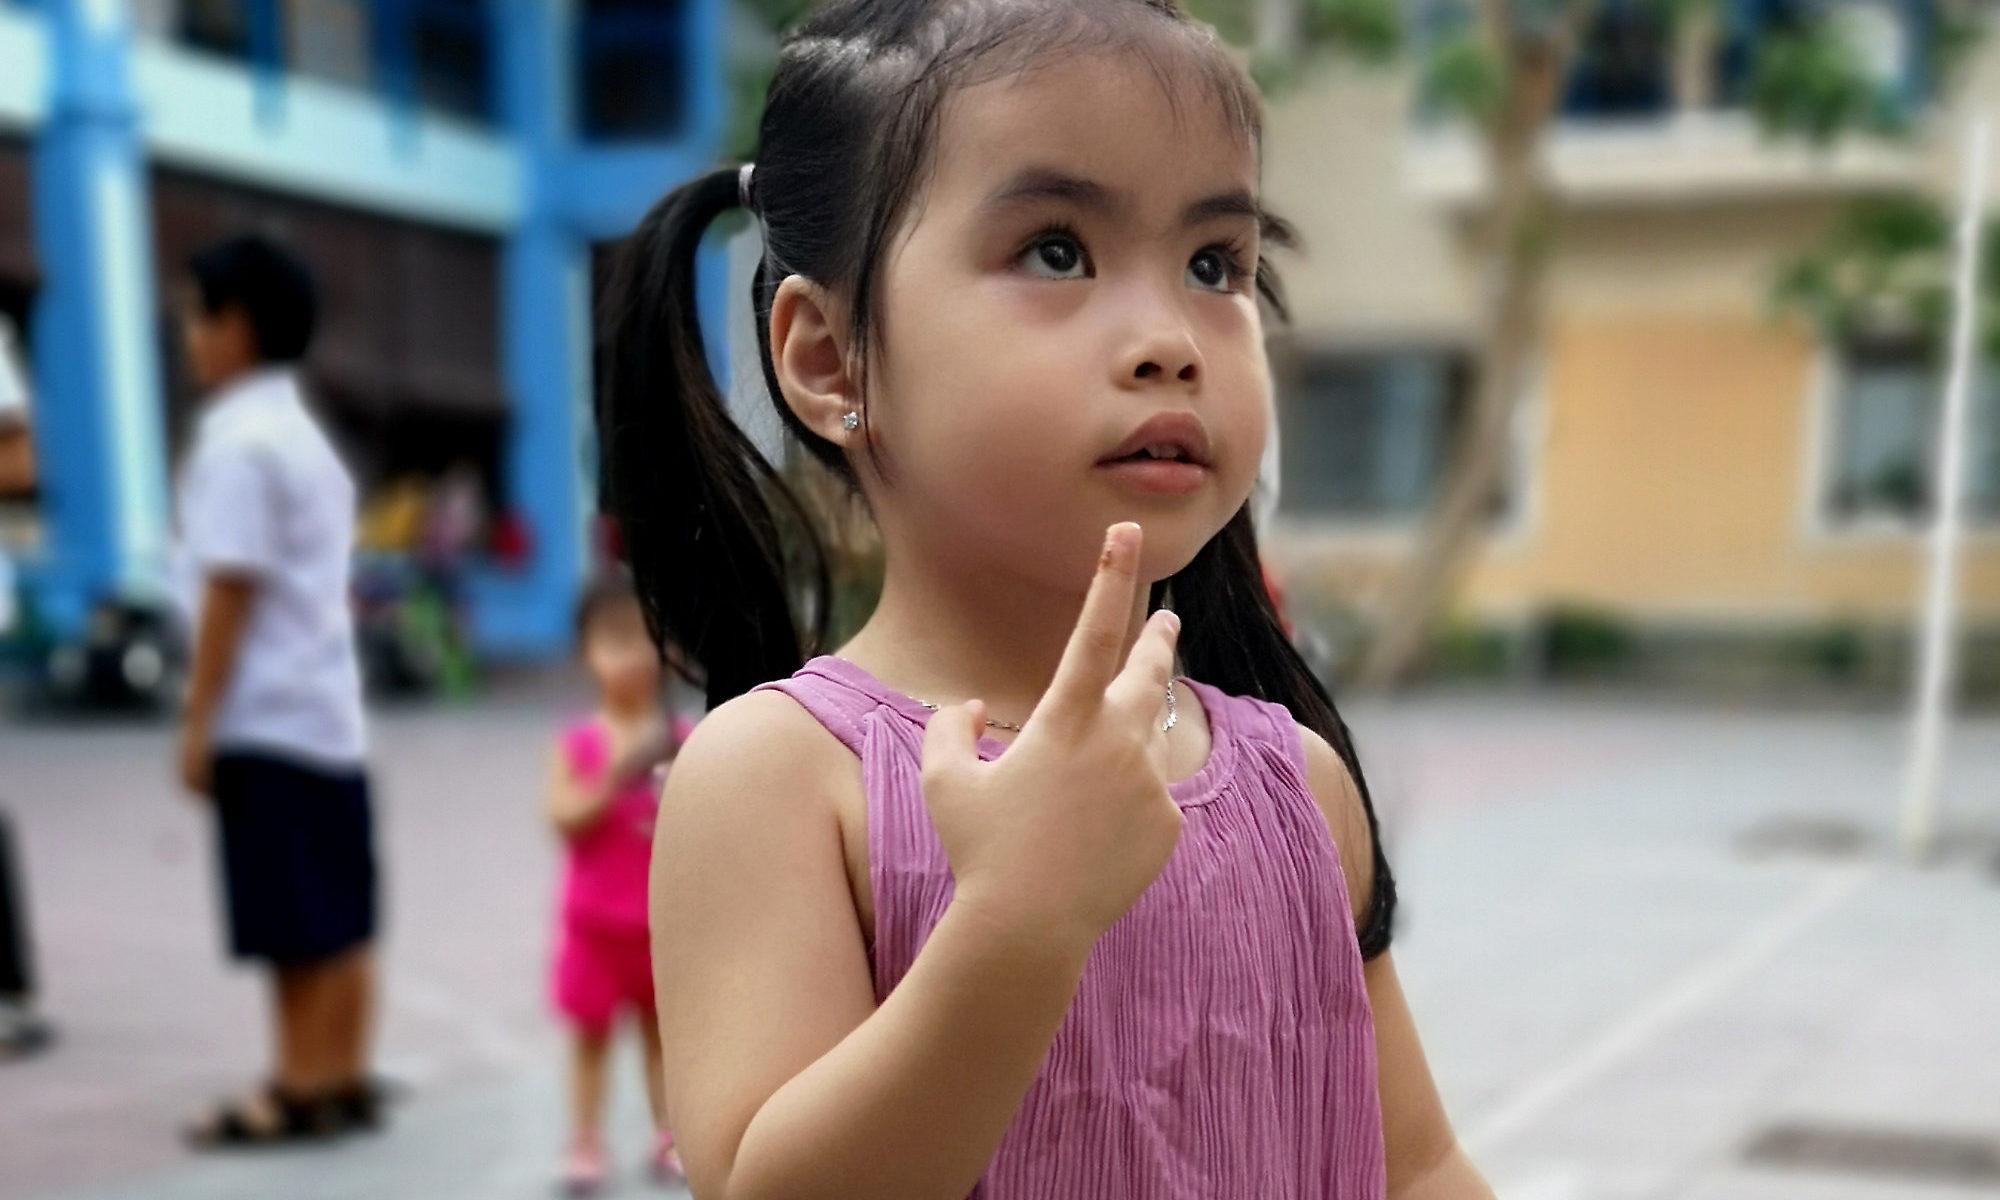 Maison Chance Saigon (HCMC), Vietnam